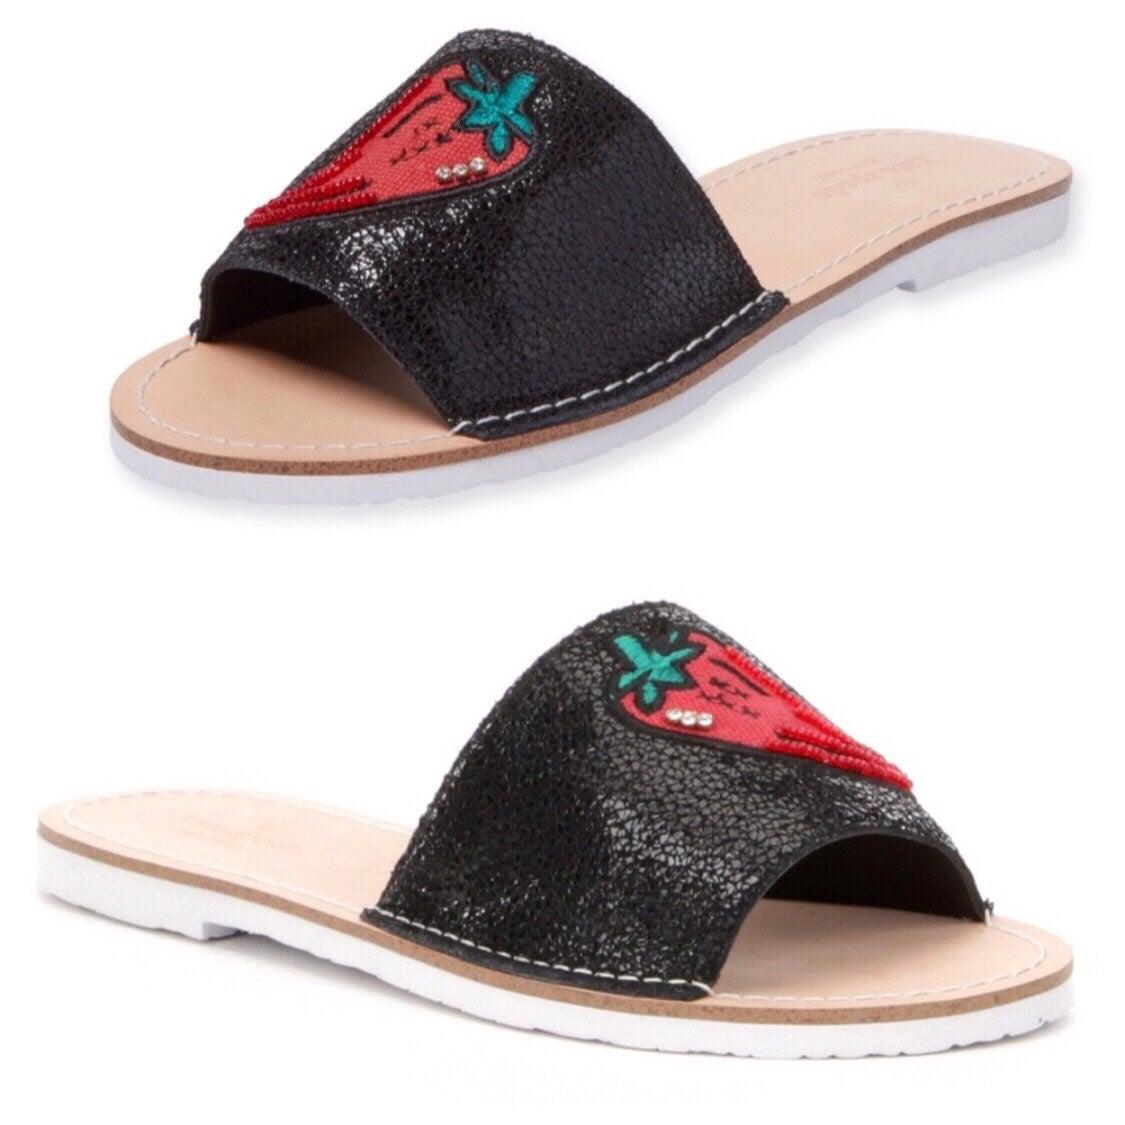 NWT Kate Spade Chili Pepper Sandals